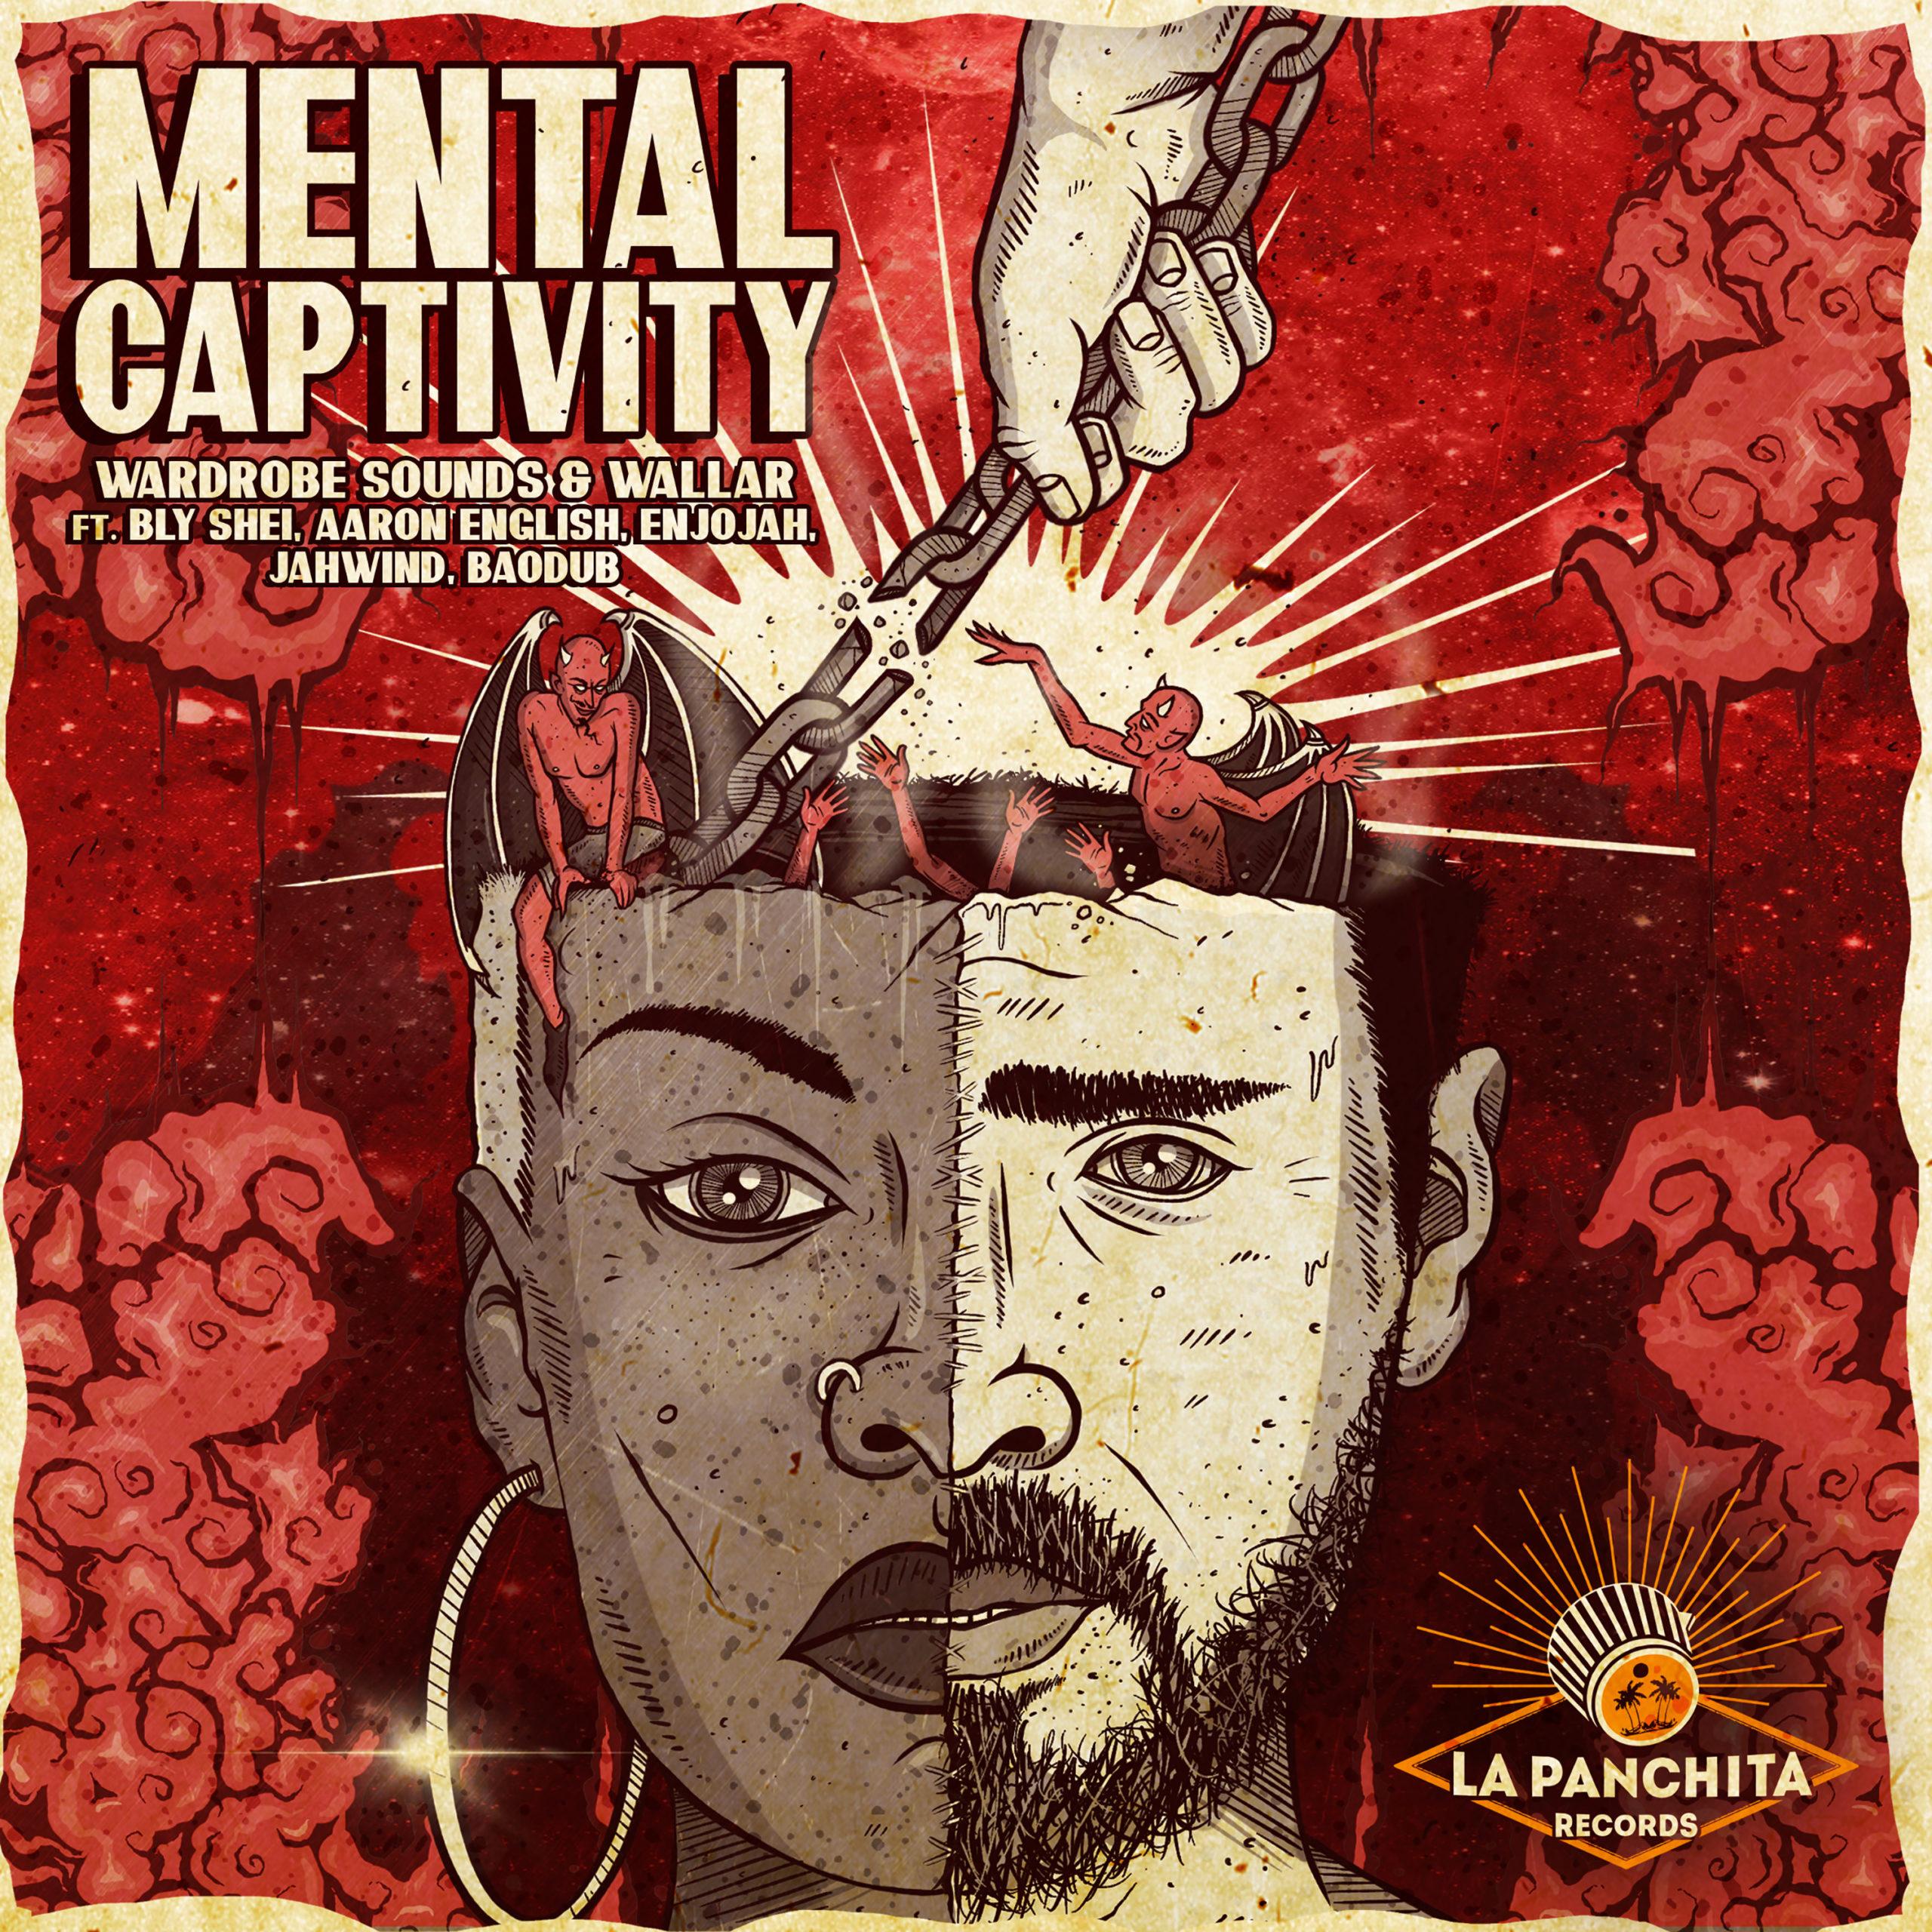 Mental Captivity